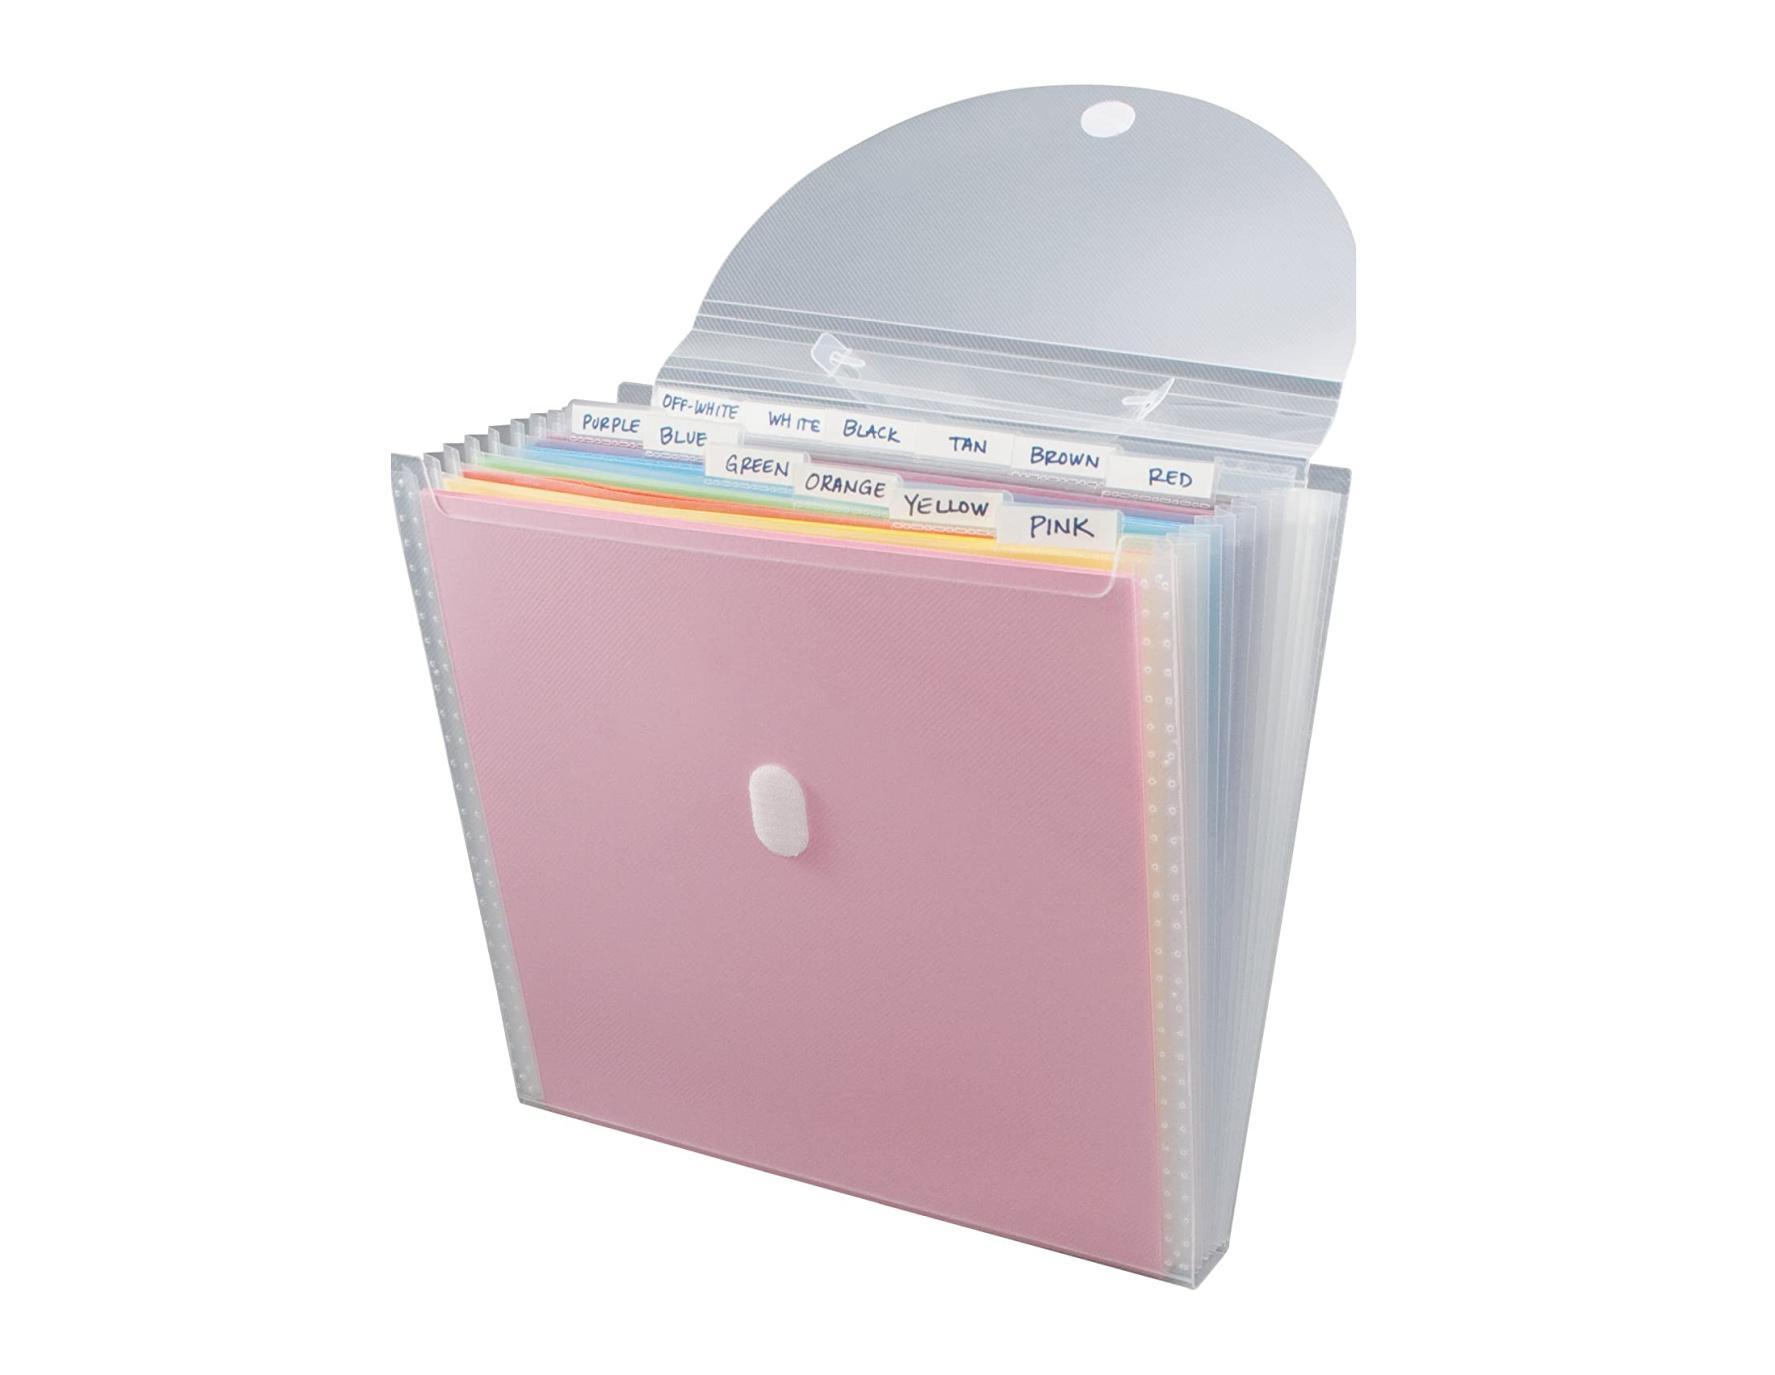 Storage Studios Expandable Paper Organizer 12 Pockets